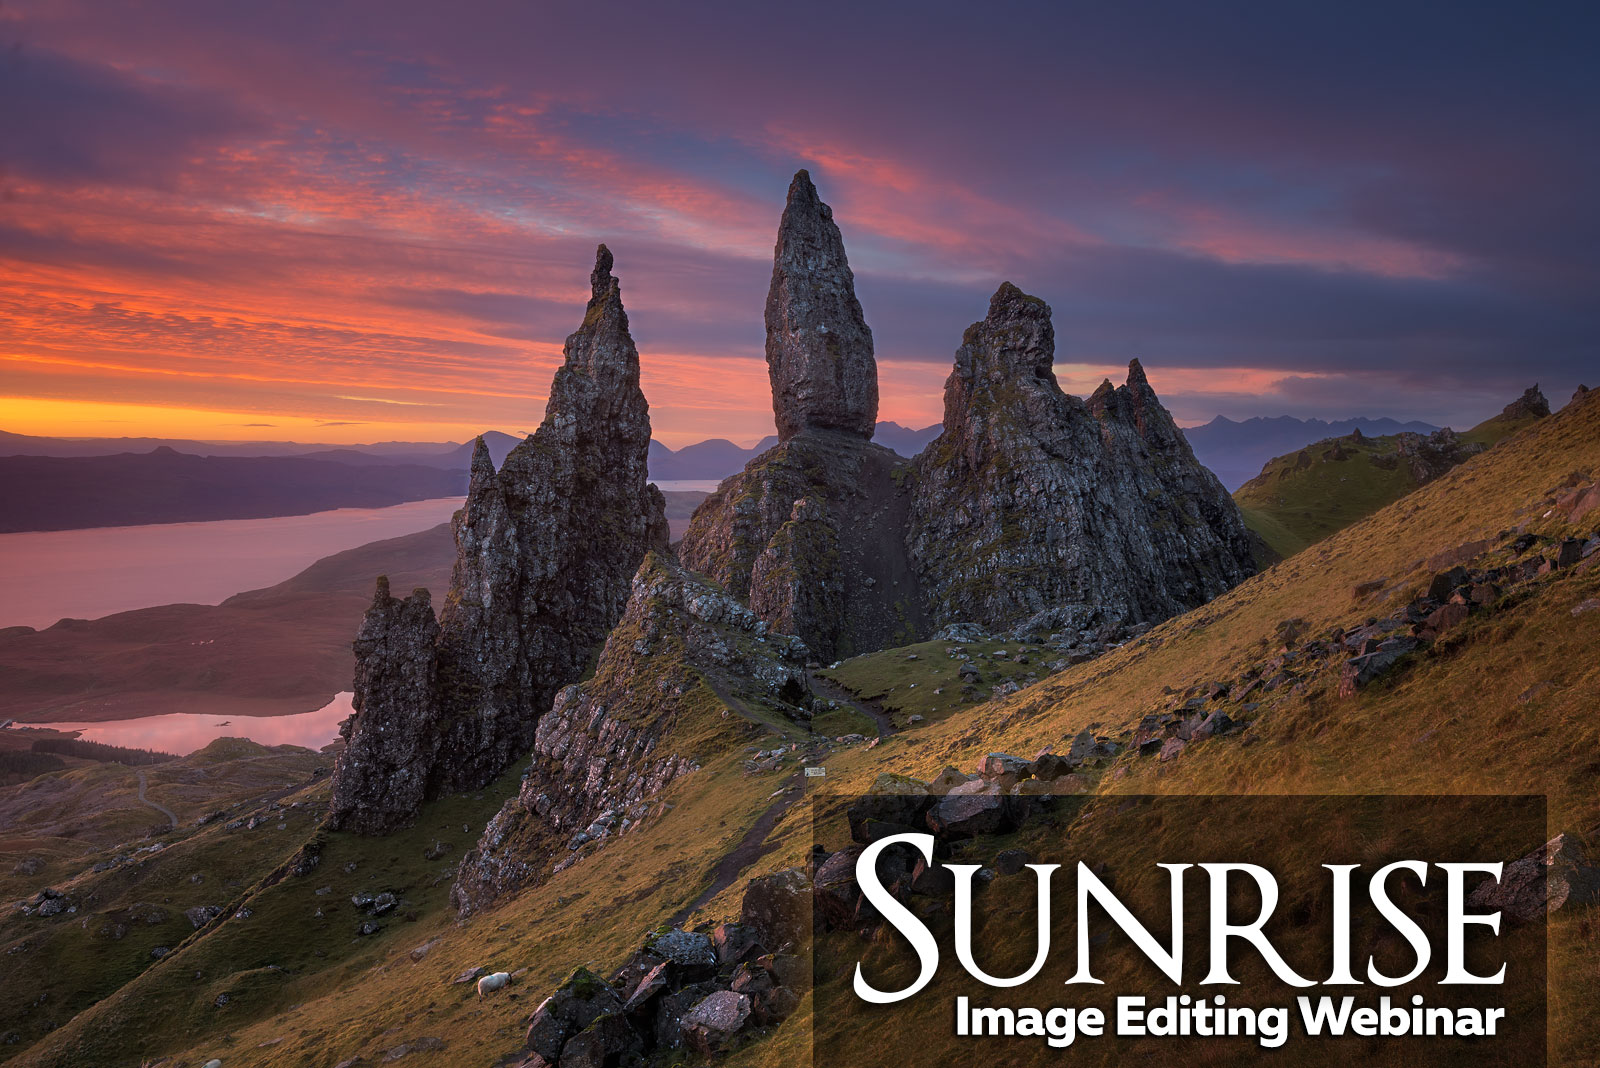 Sunrise Photoshop Video Tutorial Webinar